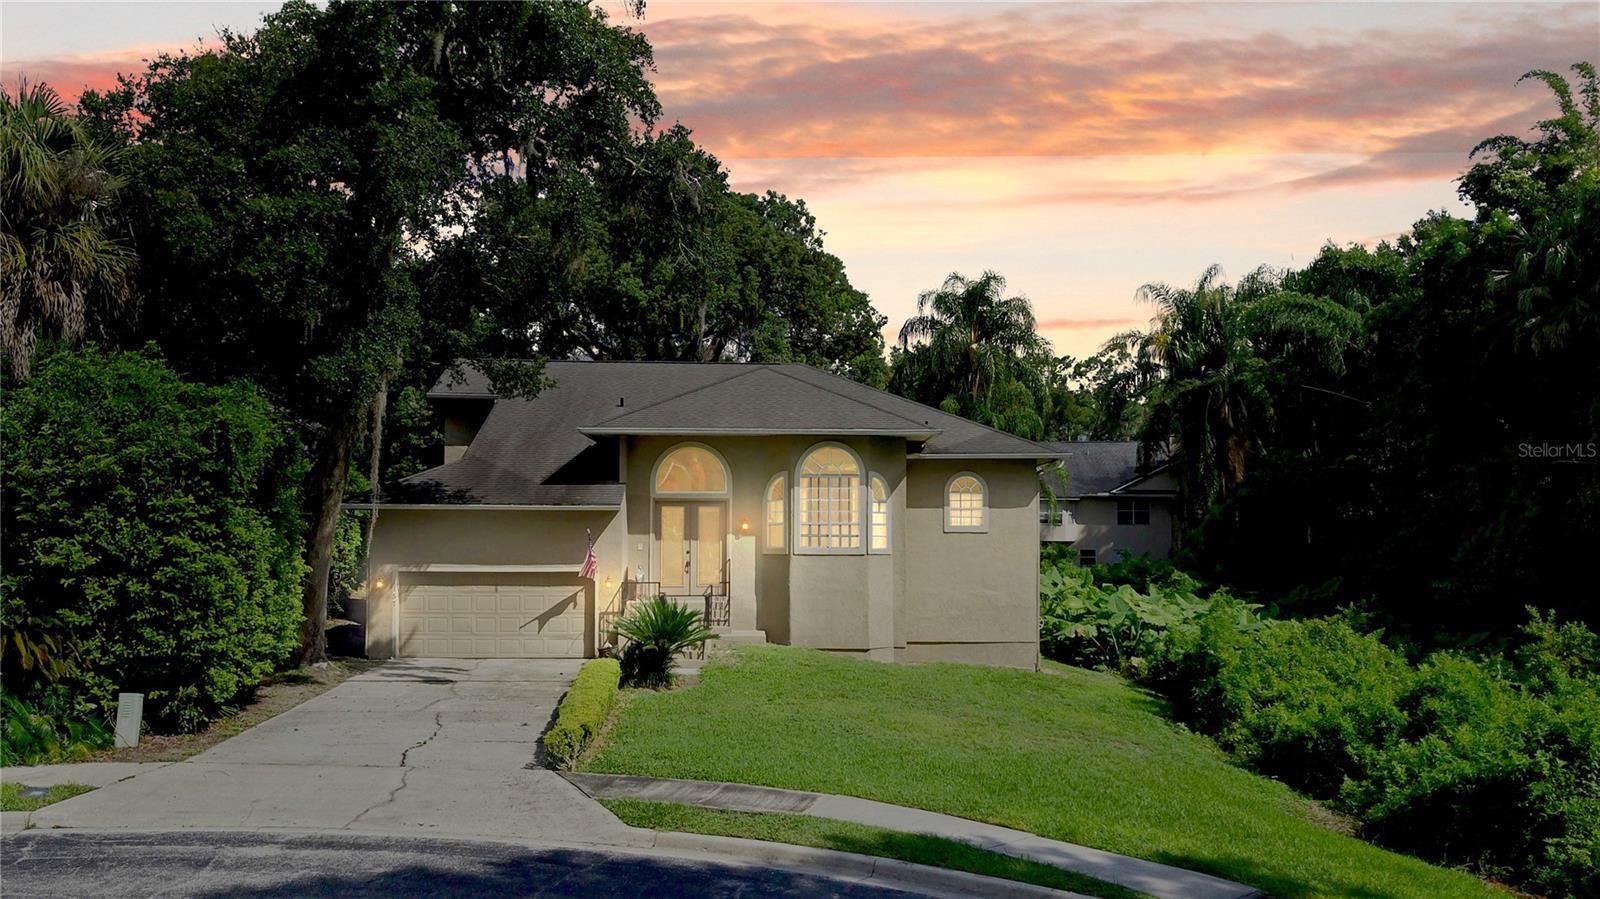 1157 OAK TREE CIRCLE, Altamonte Springs, FL 32714 - #: O5962202